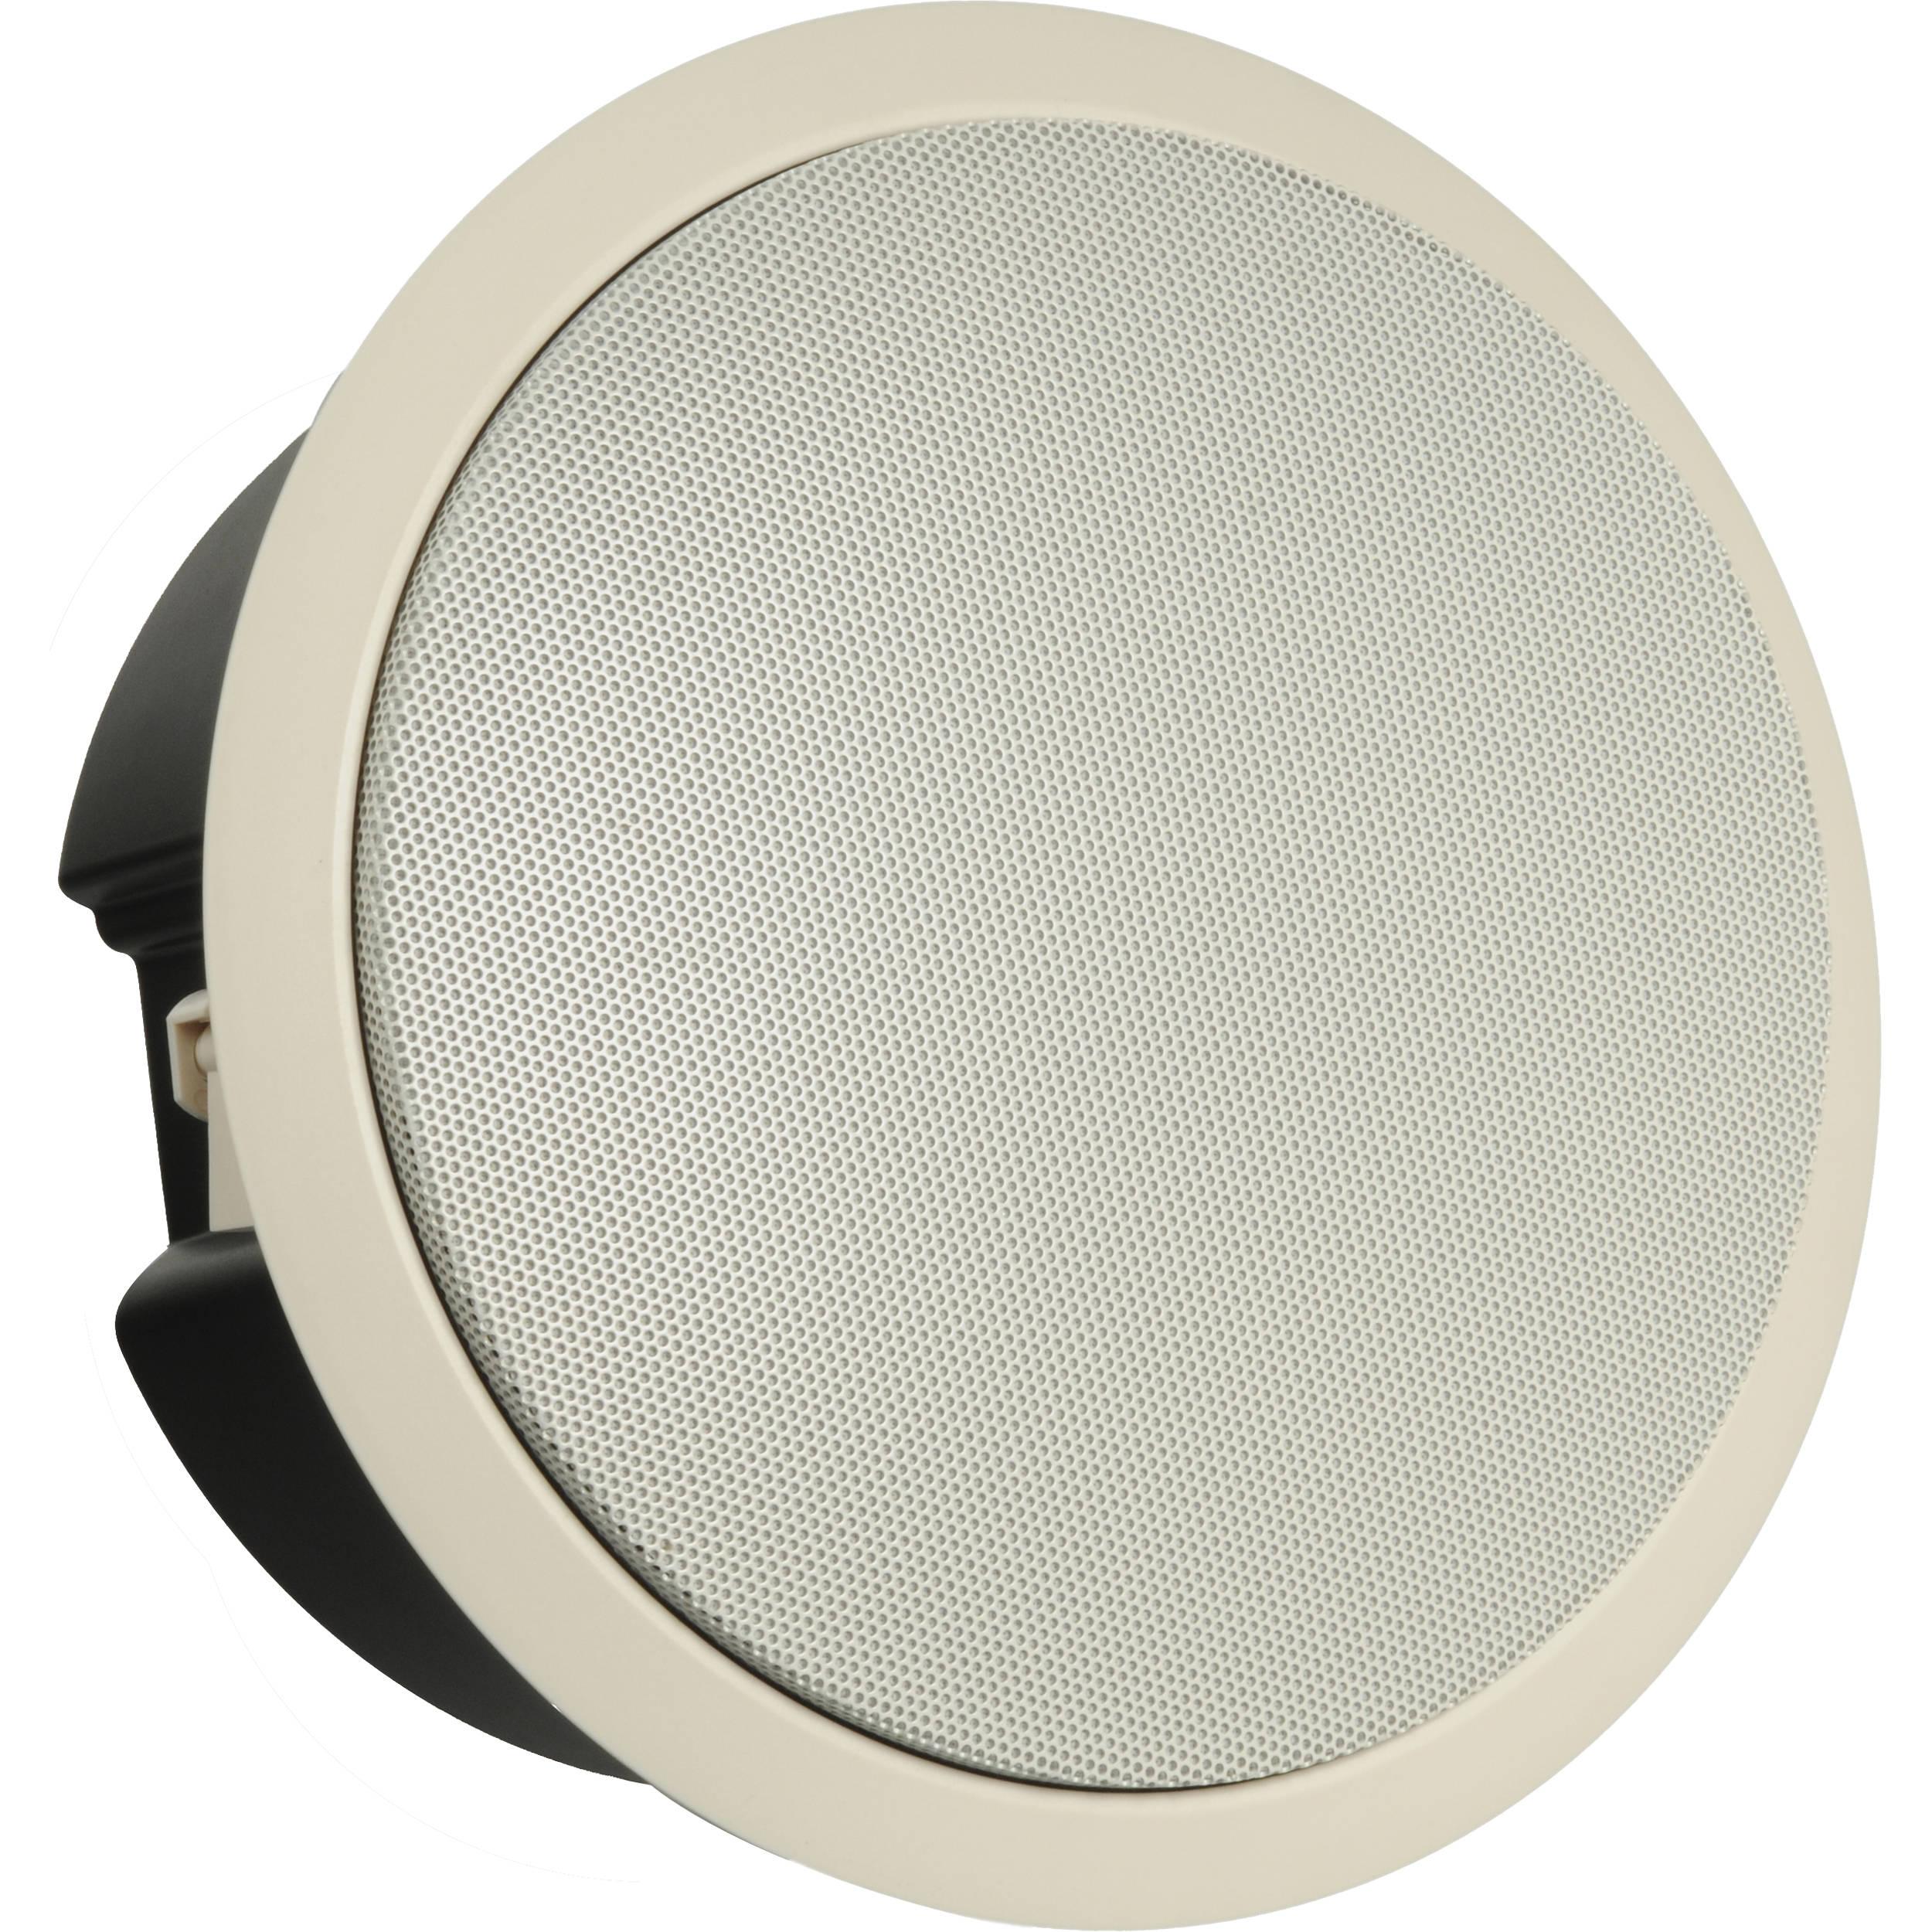 speakers pair micro loudspeakers plus view jbl professional control in loudspeaker speaker ceiling angle sold and front music pairs two background idjnow